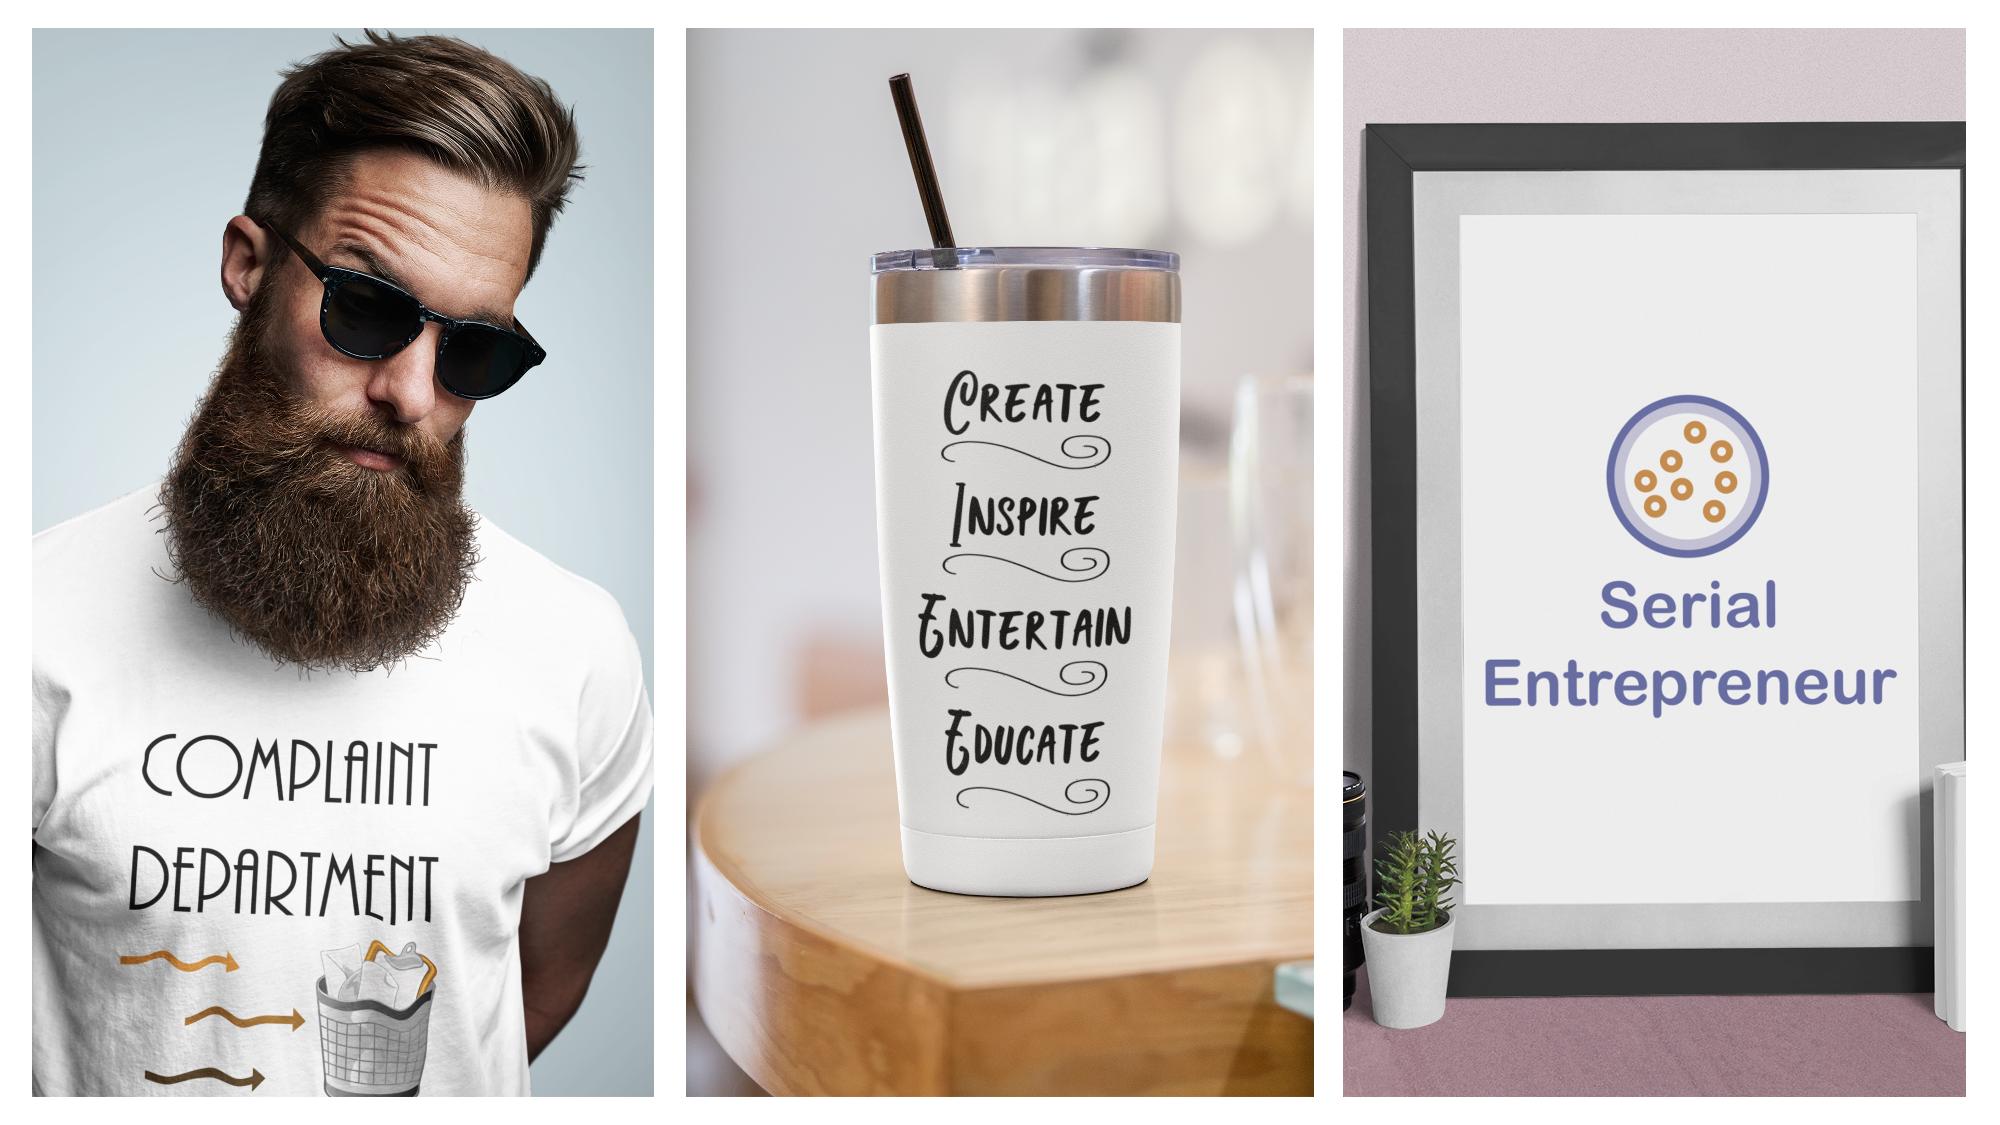 POD templates to make t-shirts, mugs, wall art and more